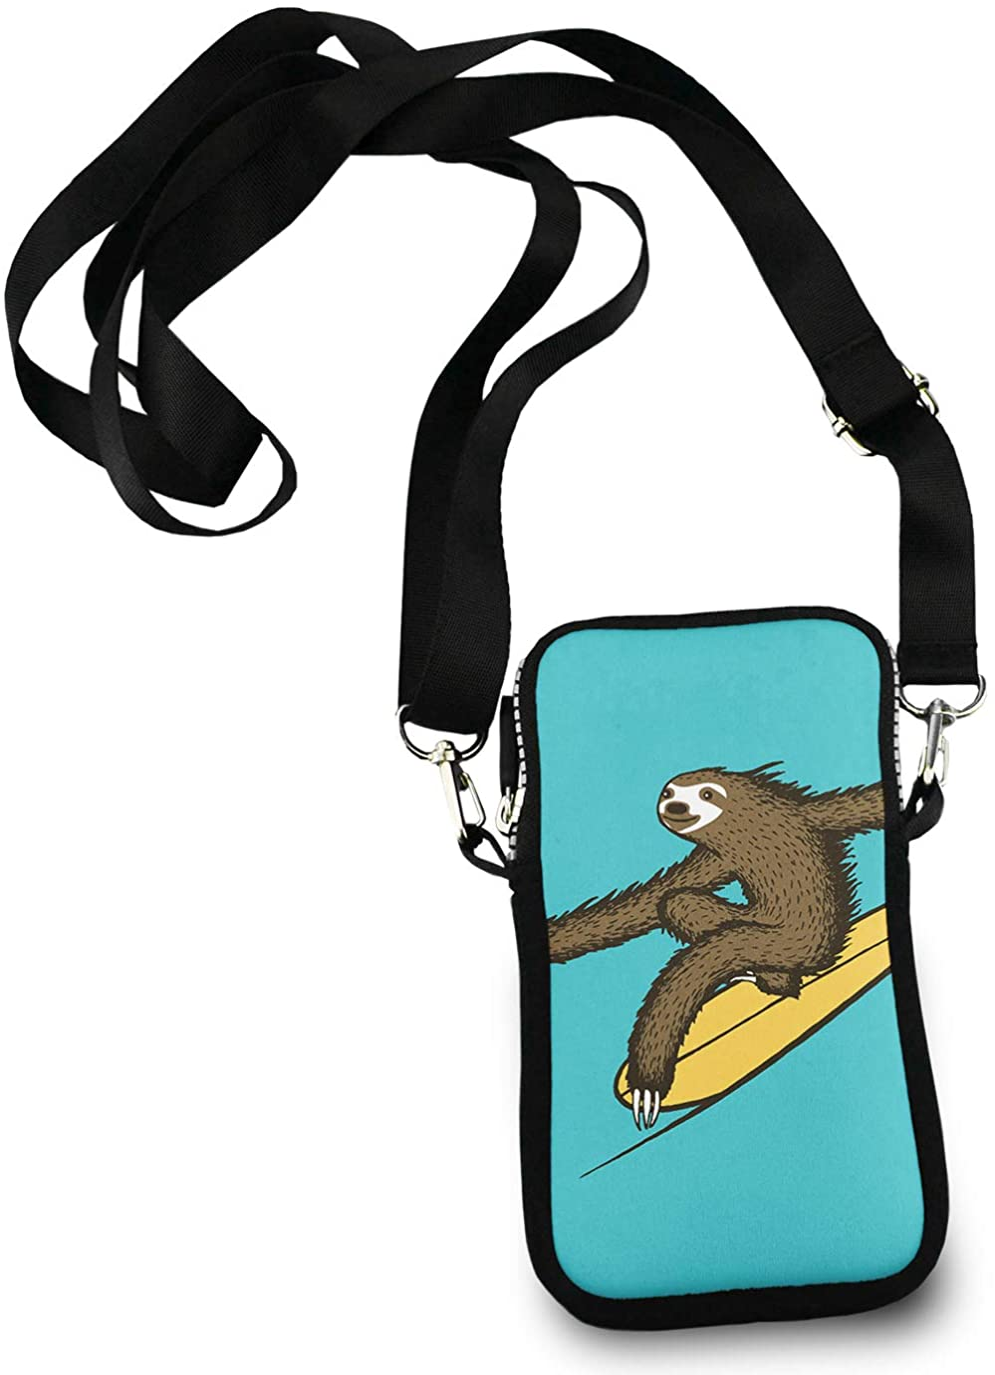 Cell Phone Purse Mini Crossbody Bag Smartphone Wallet Headphone Bag Surfing Sloth